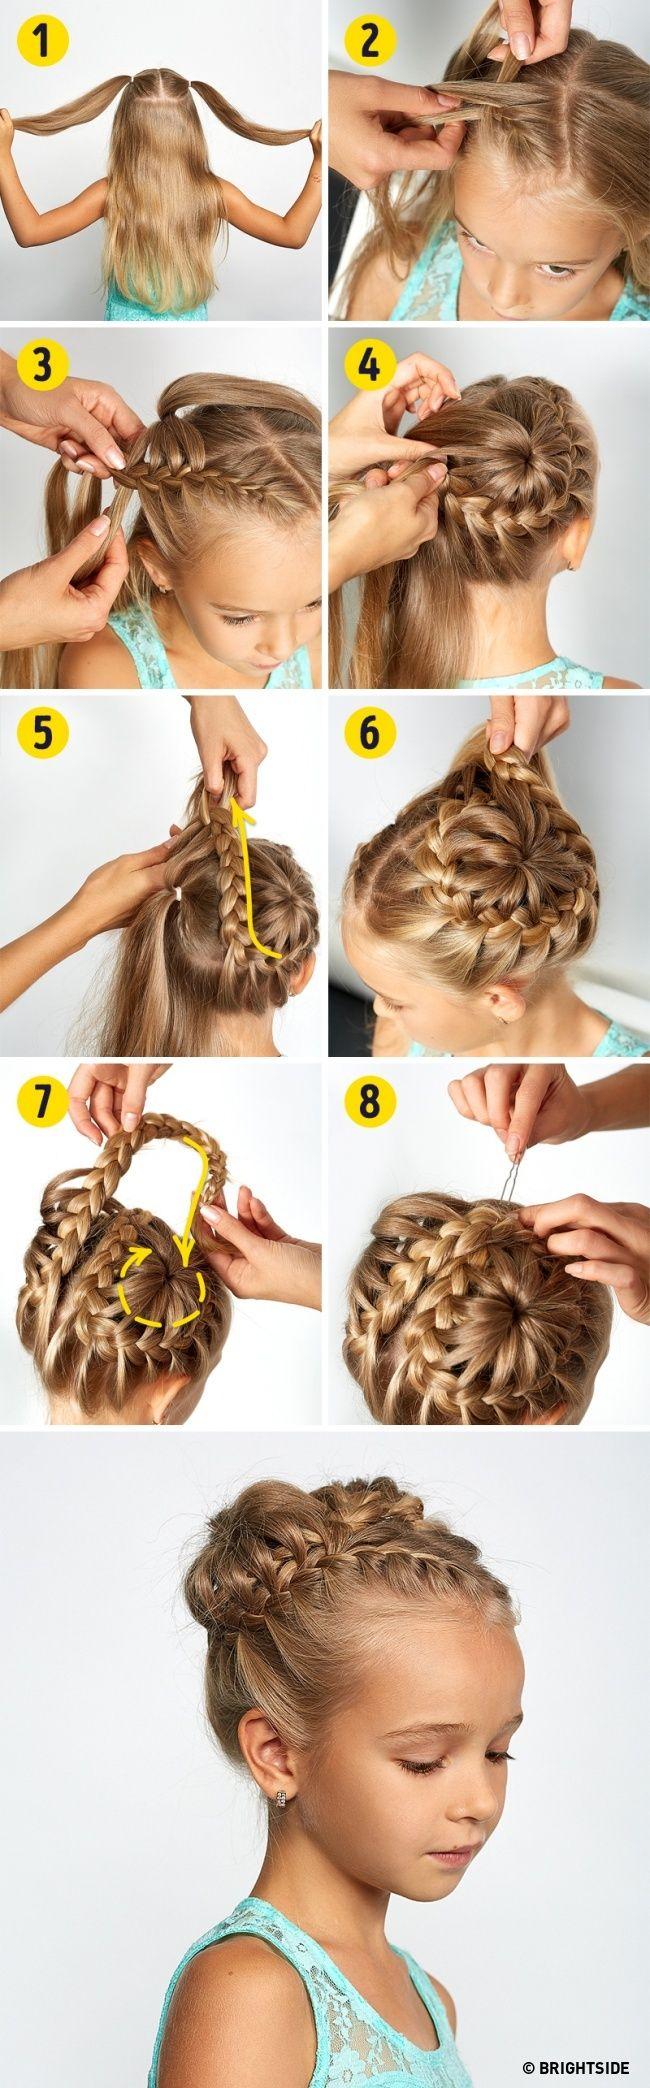 5 hairstyles make princess